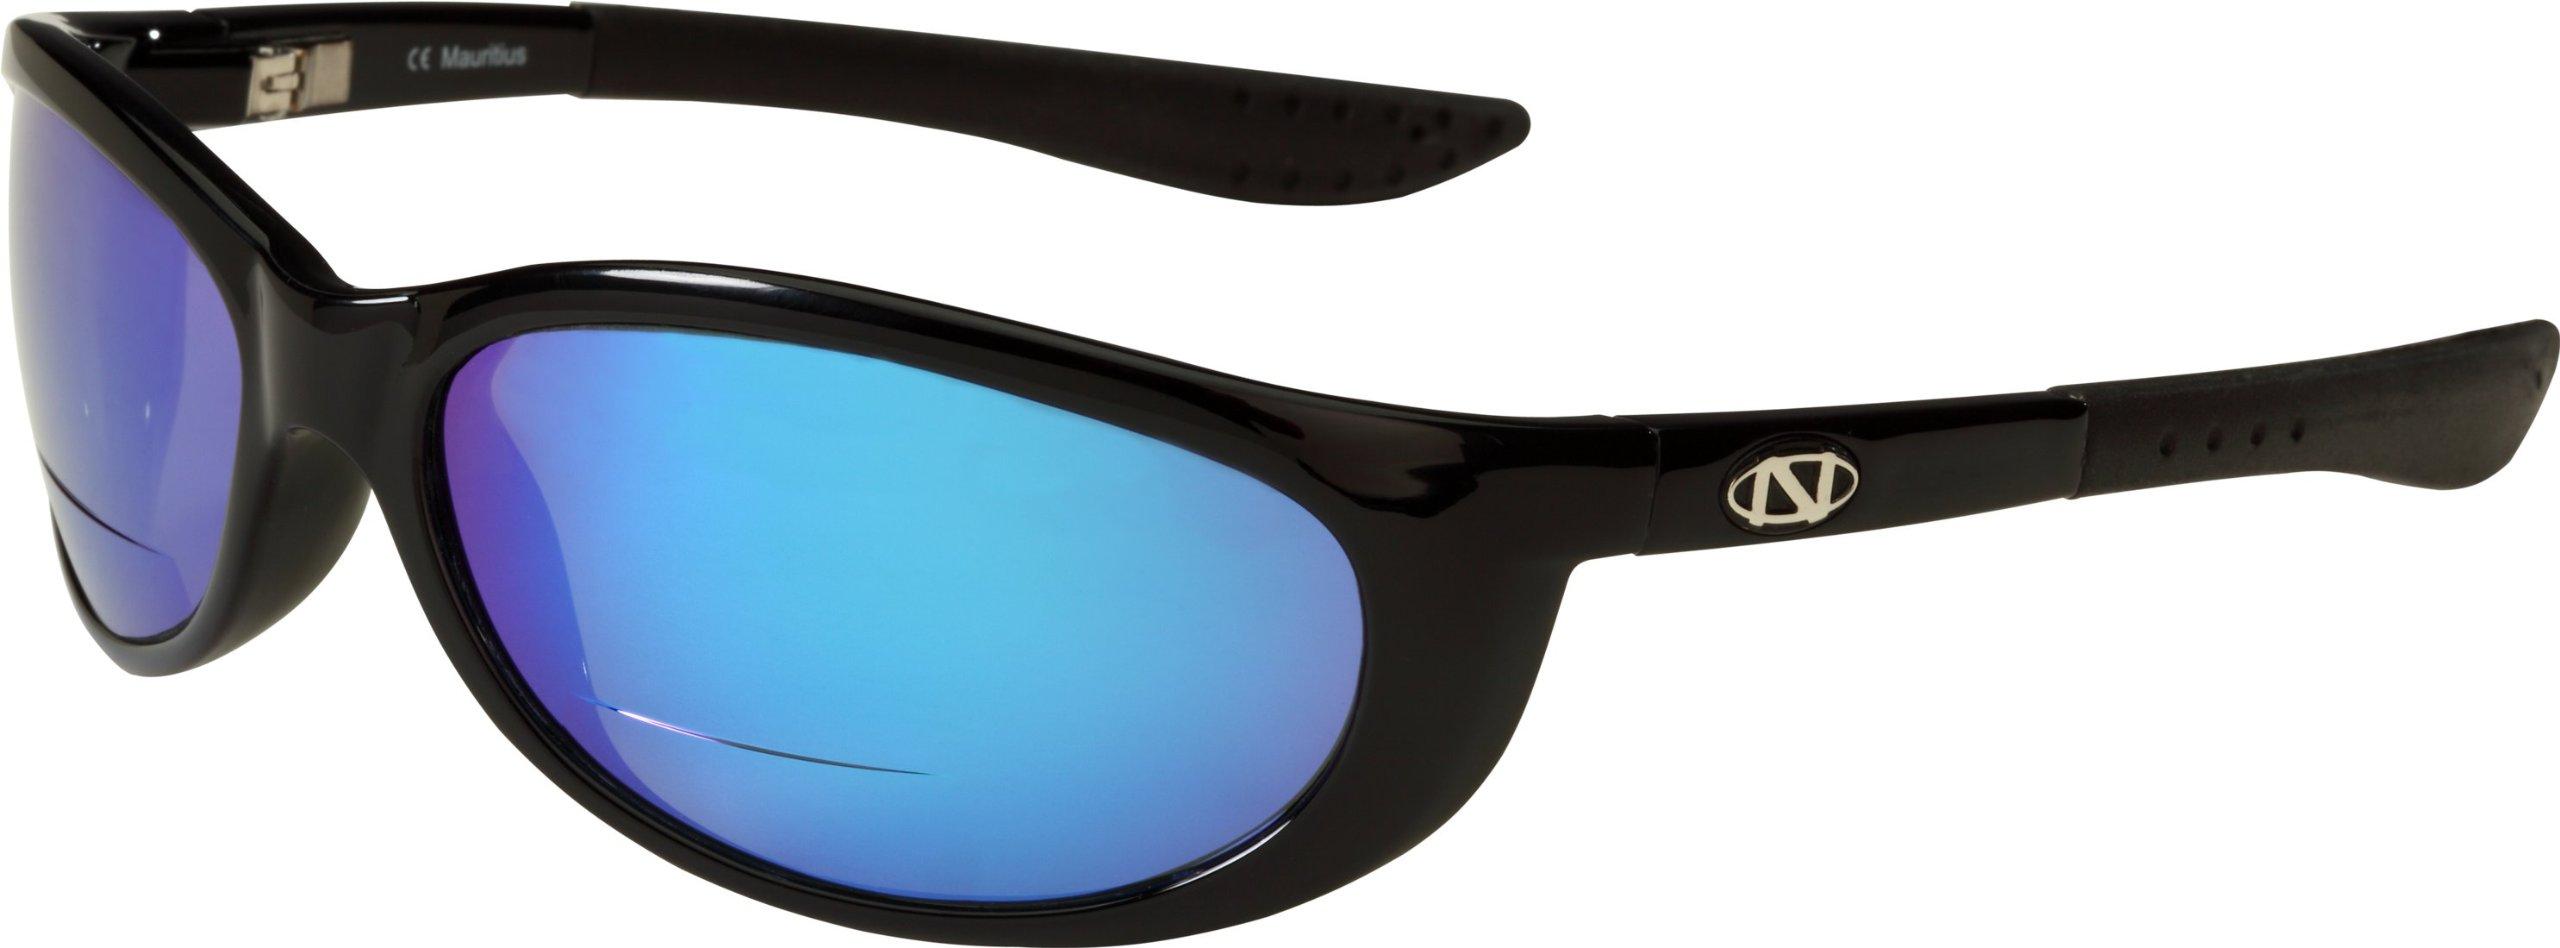 ONOS Petit Boy Polarized Sunglasses (+2 Add Power), Black, Blue/Grey